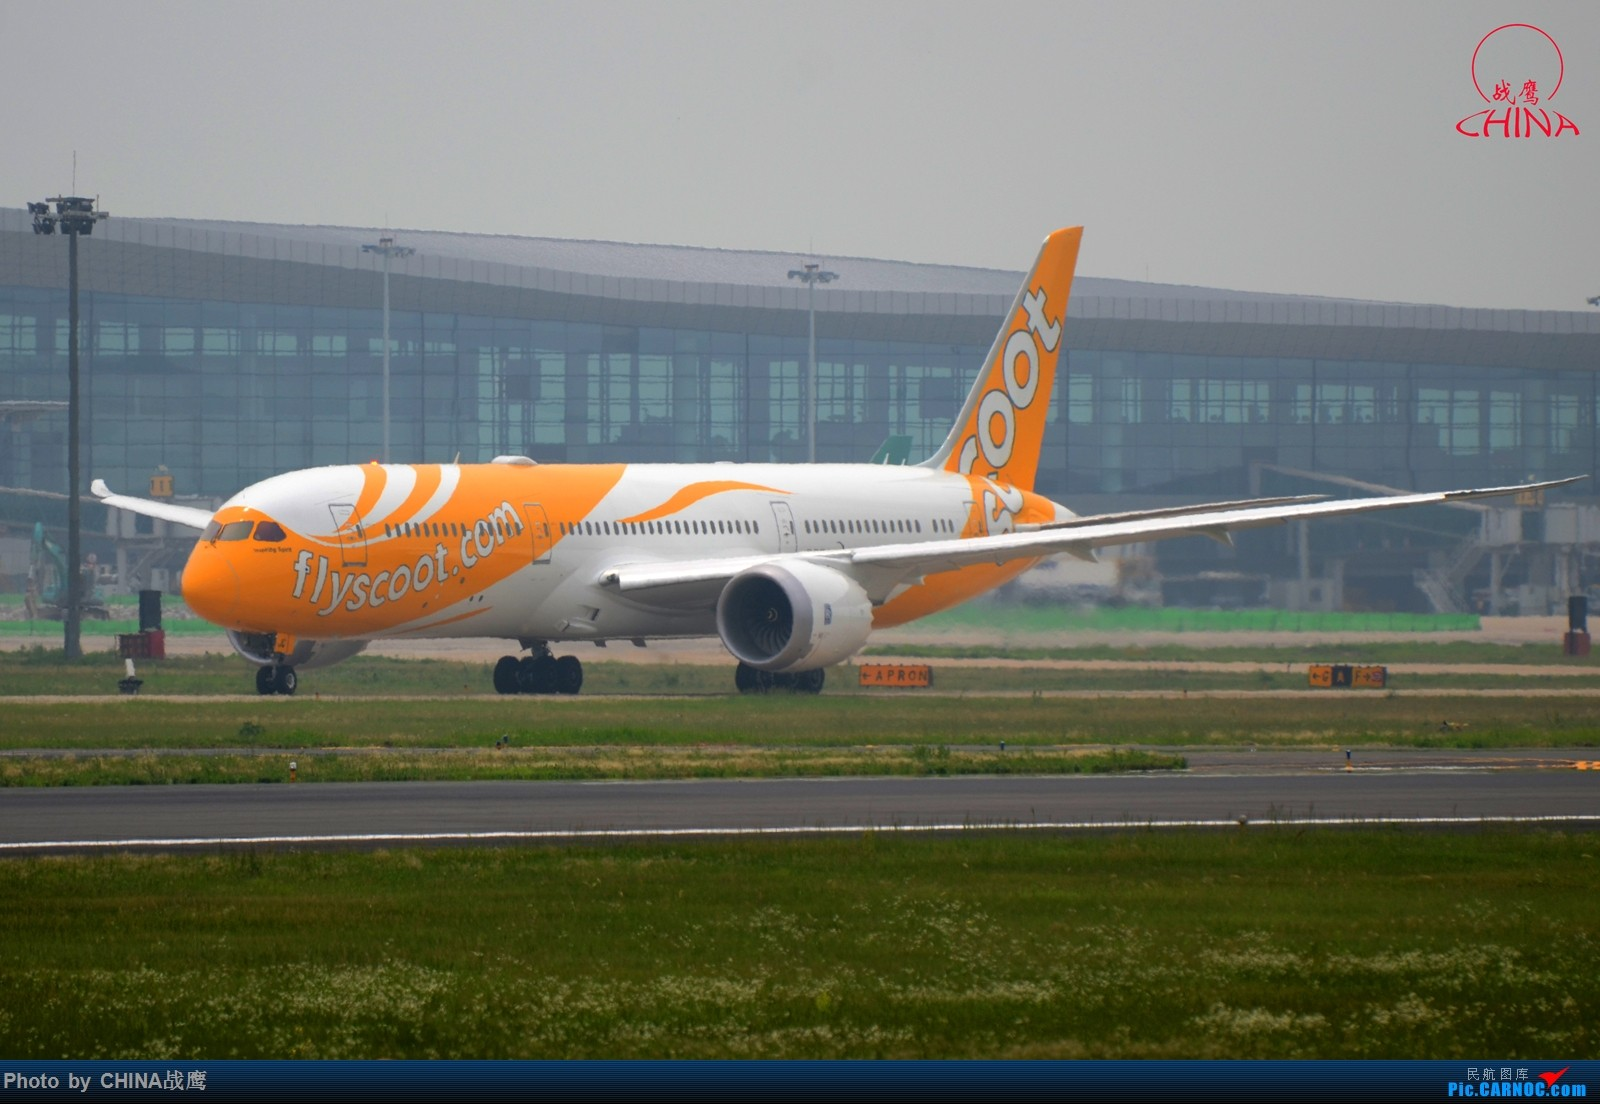 Re:[原创][SHE]透着竹竿鸟网的缝隙拍飞机 BOEING 787-9 9V-OJC 中国沈阳桃仙国际机场